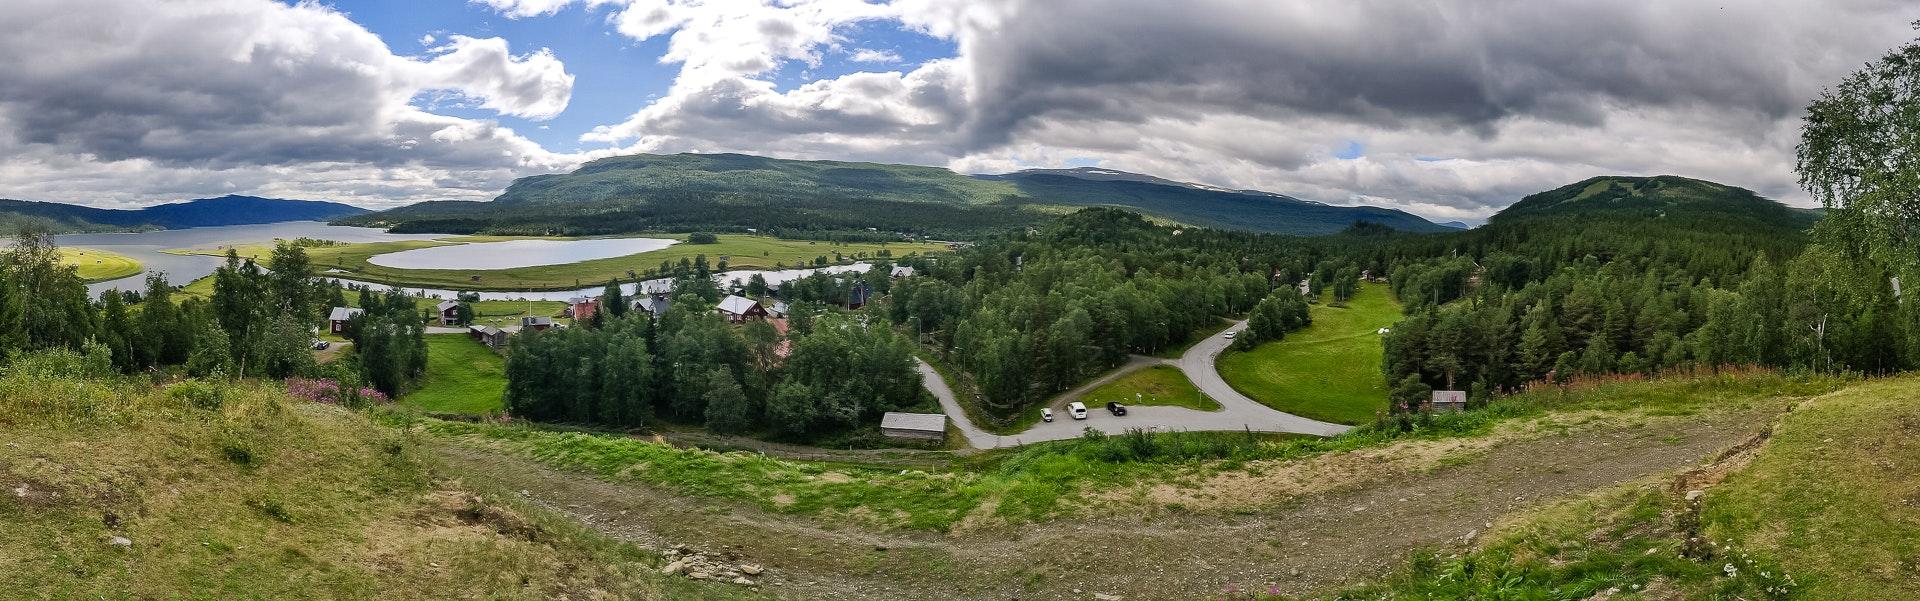 Panorama from Potatisbacken